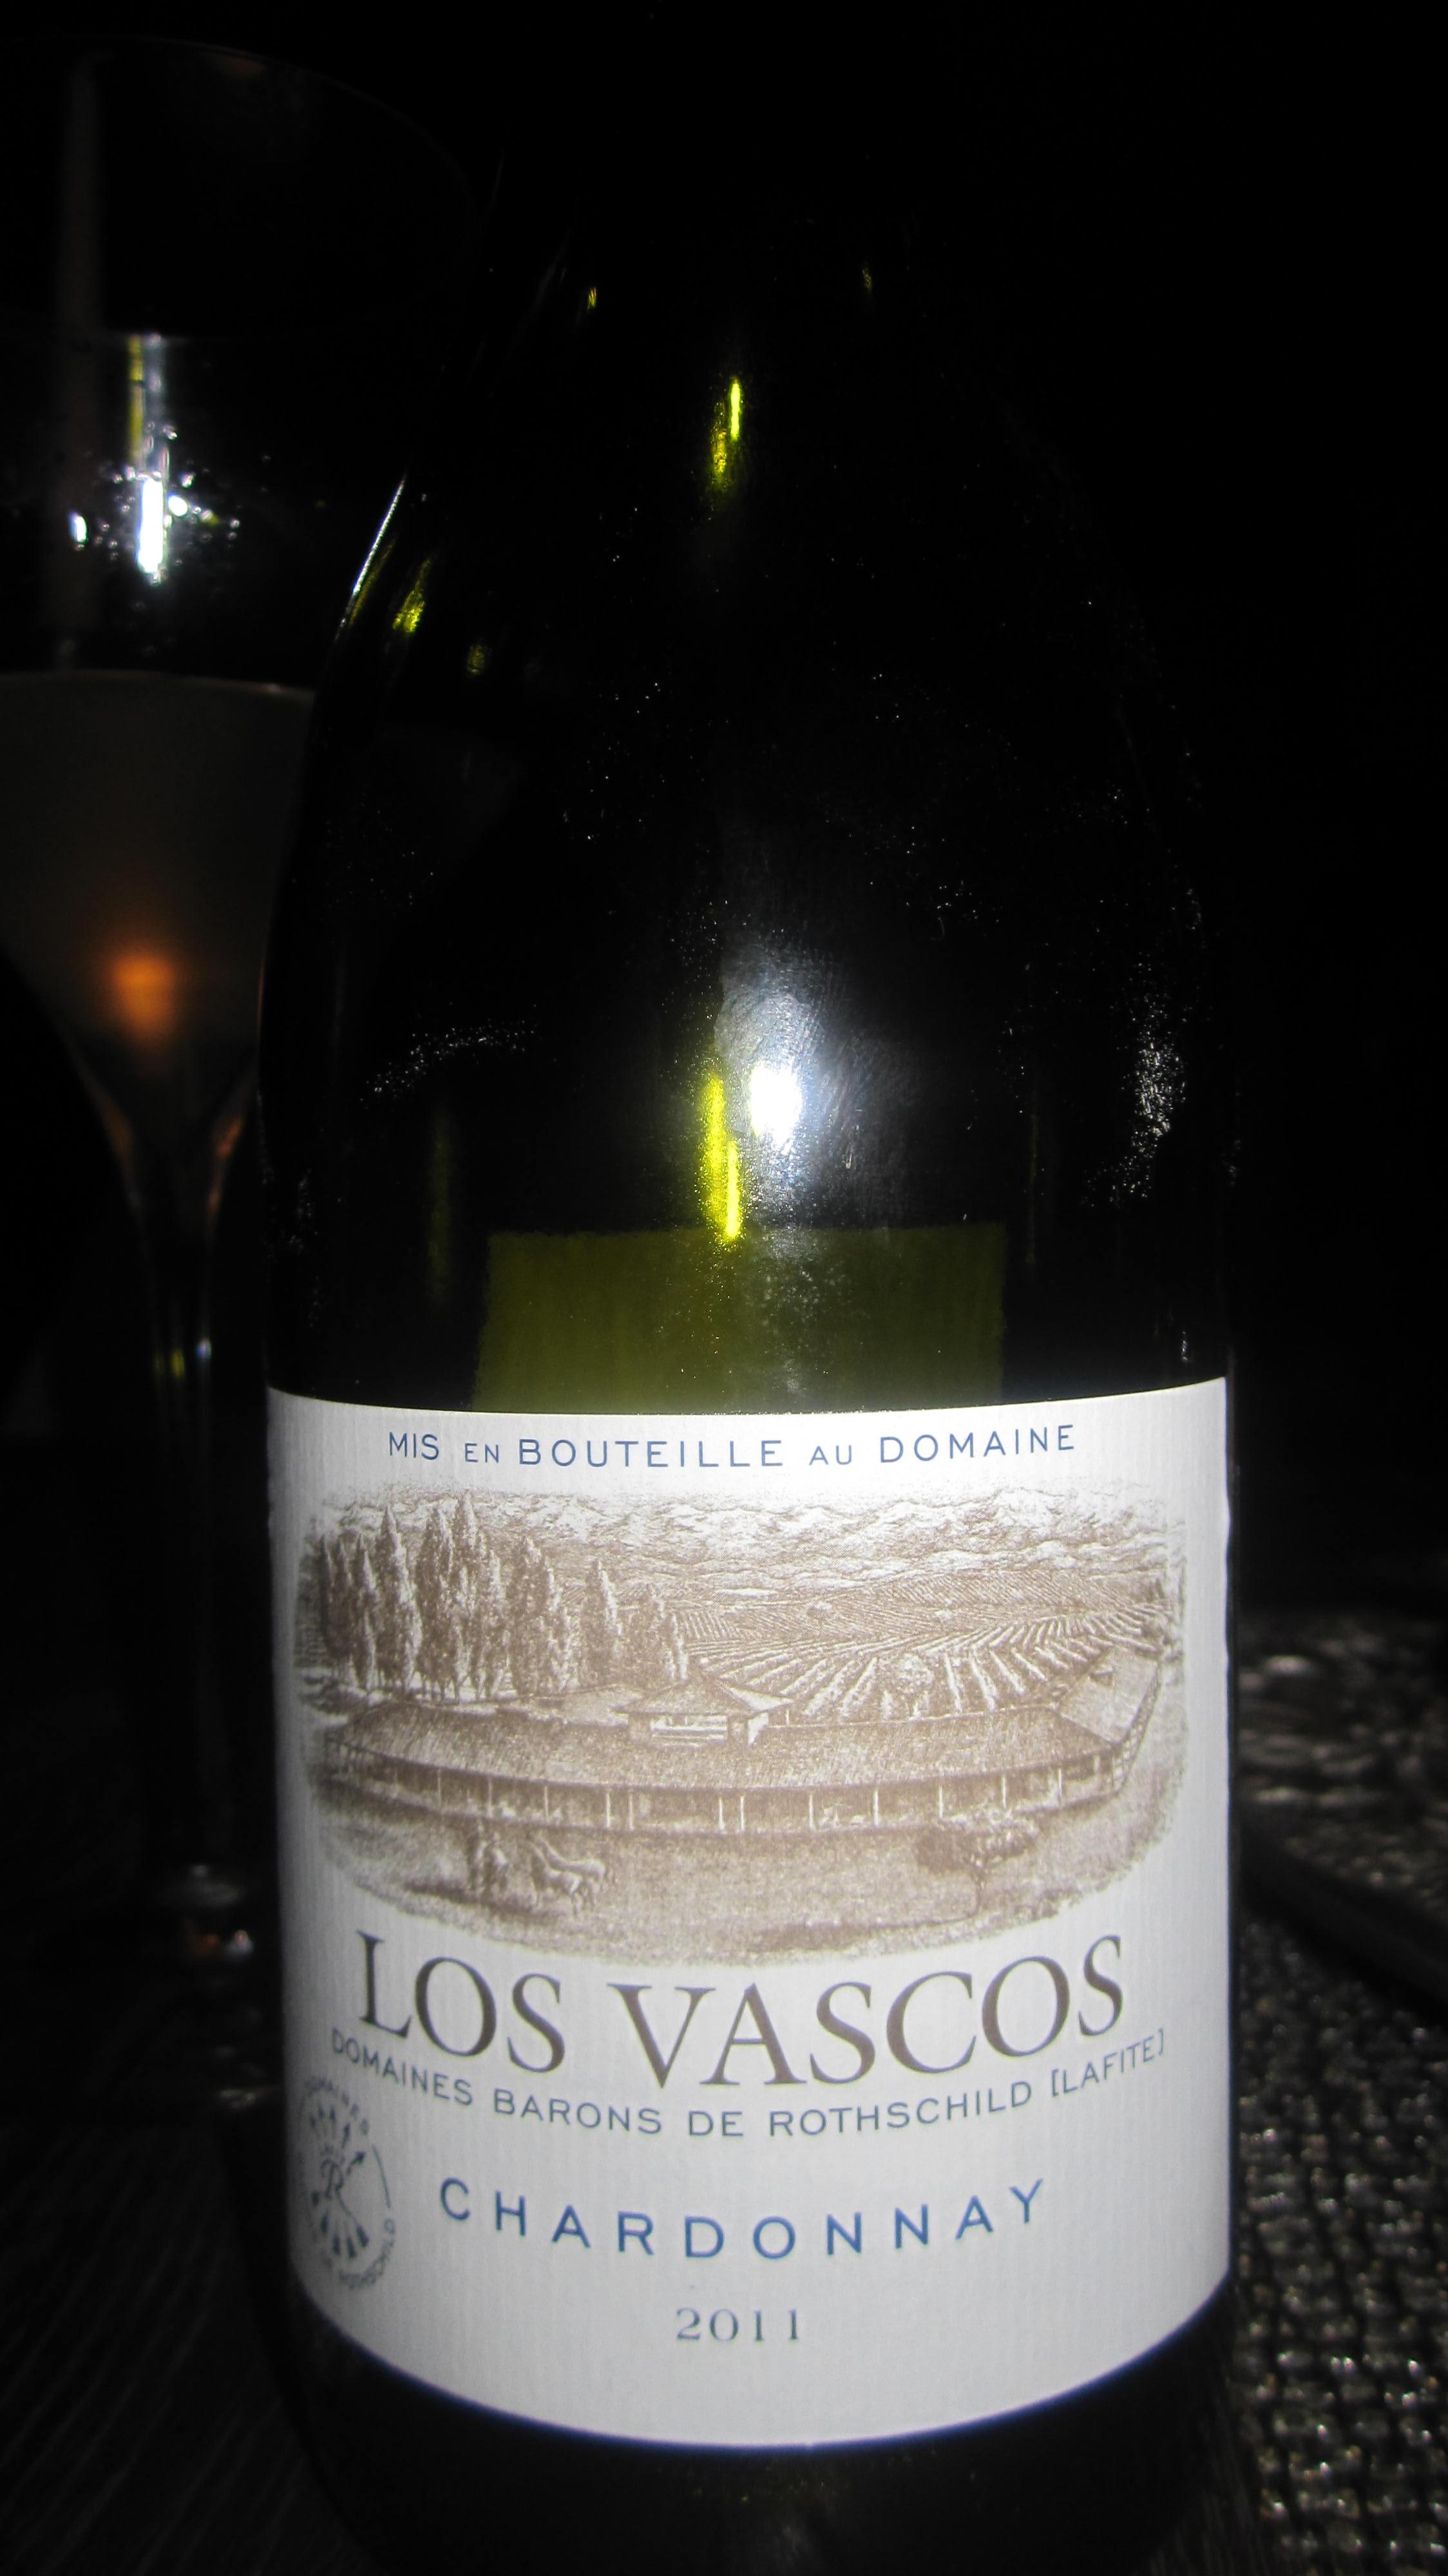 Los Vascos Chardonnay 2011, Domains Barons de Rothschild Lafite